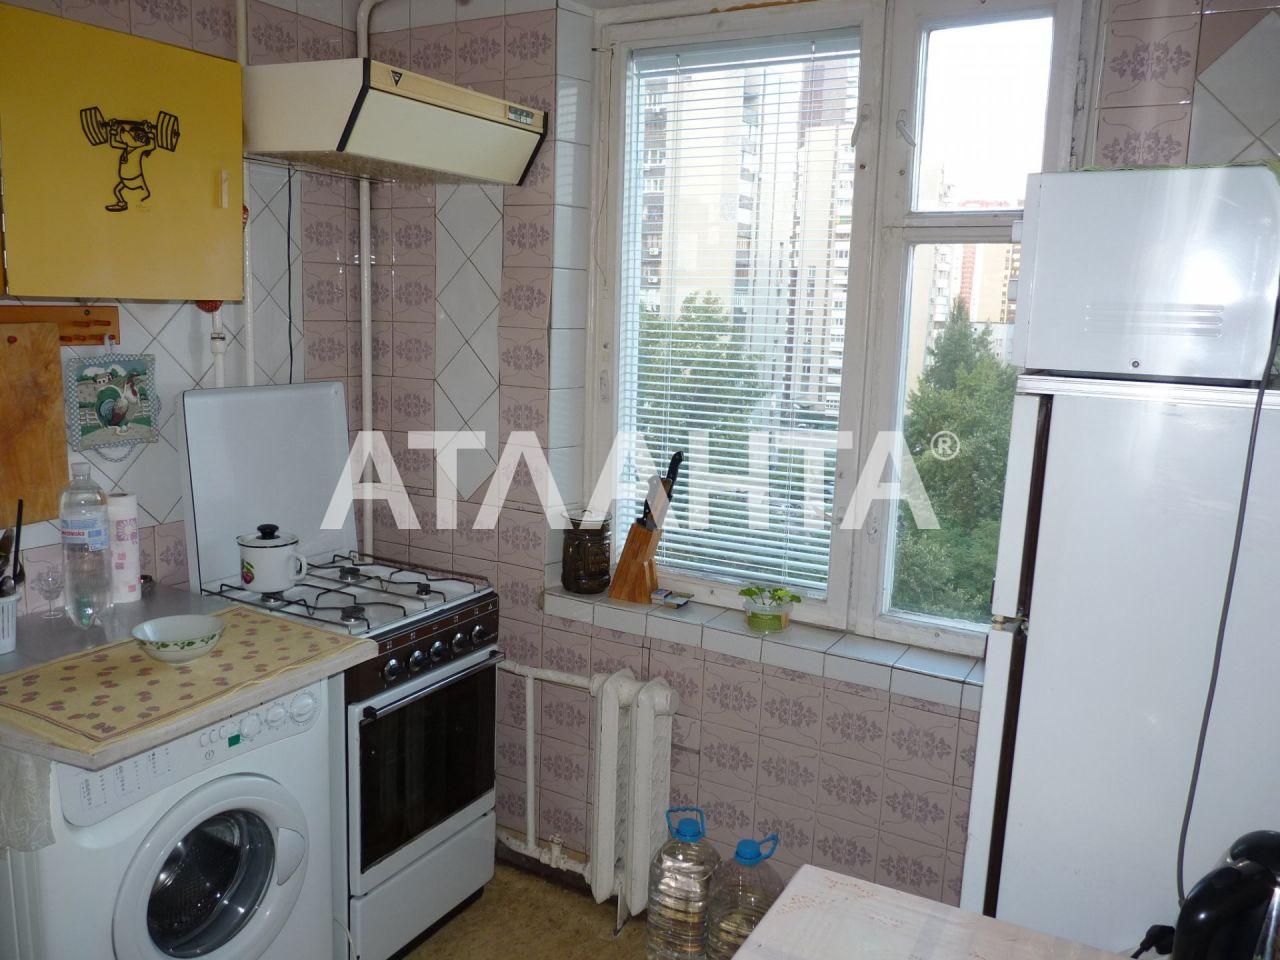 Продается 4-комнатная Квартира на ул. Днепровская Наб. — 65 000 у.е. (фото №2)